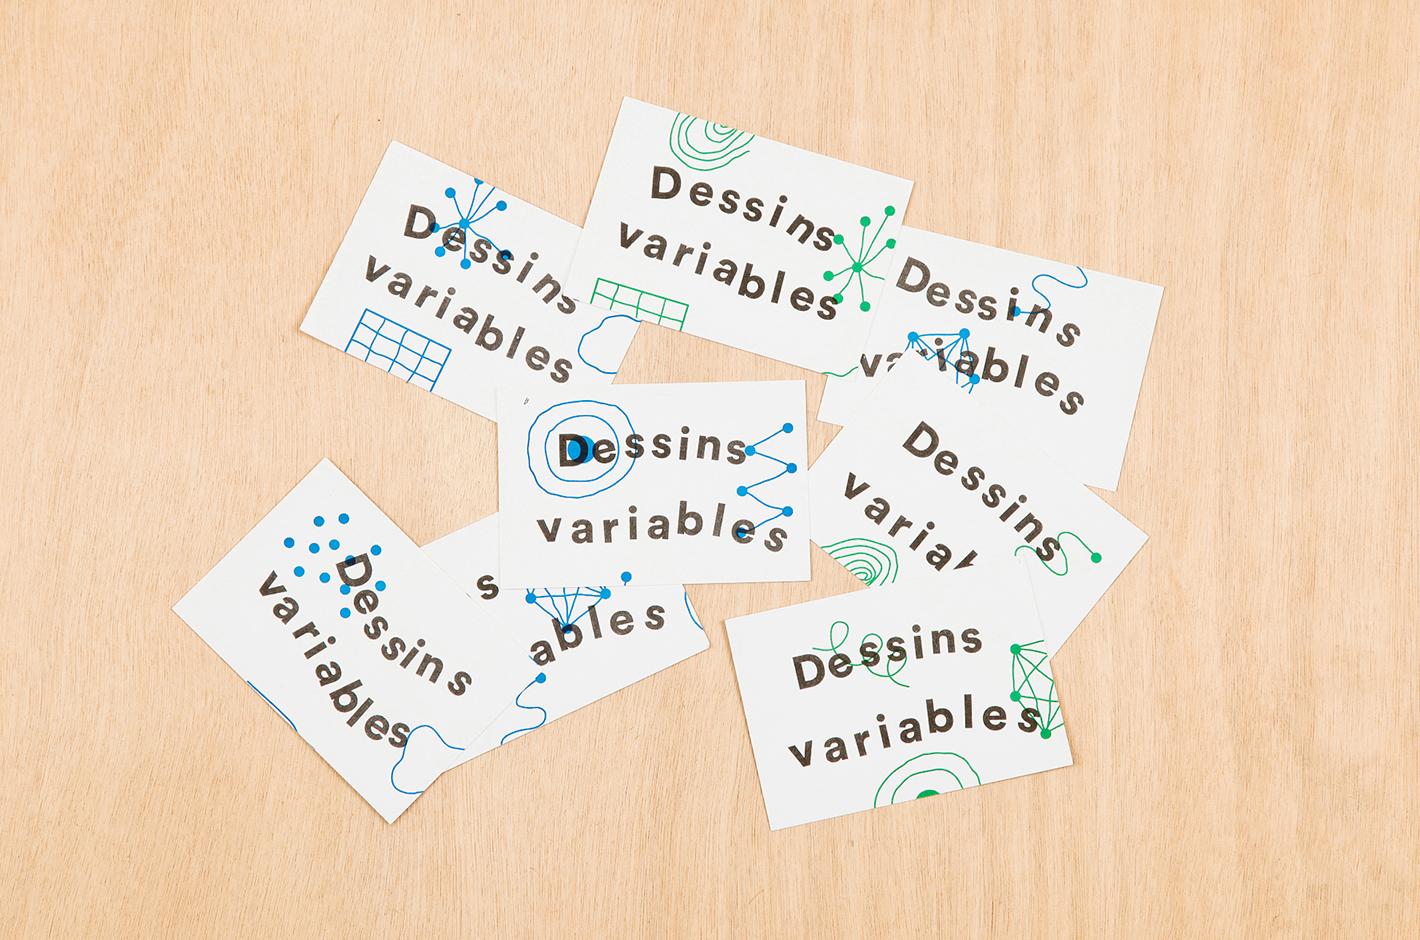 Dessin Variable